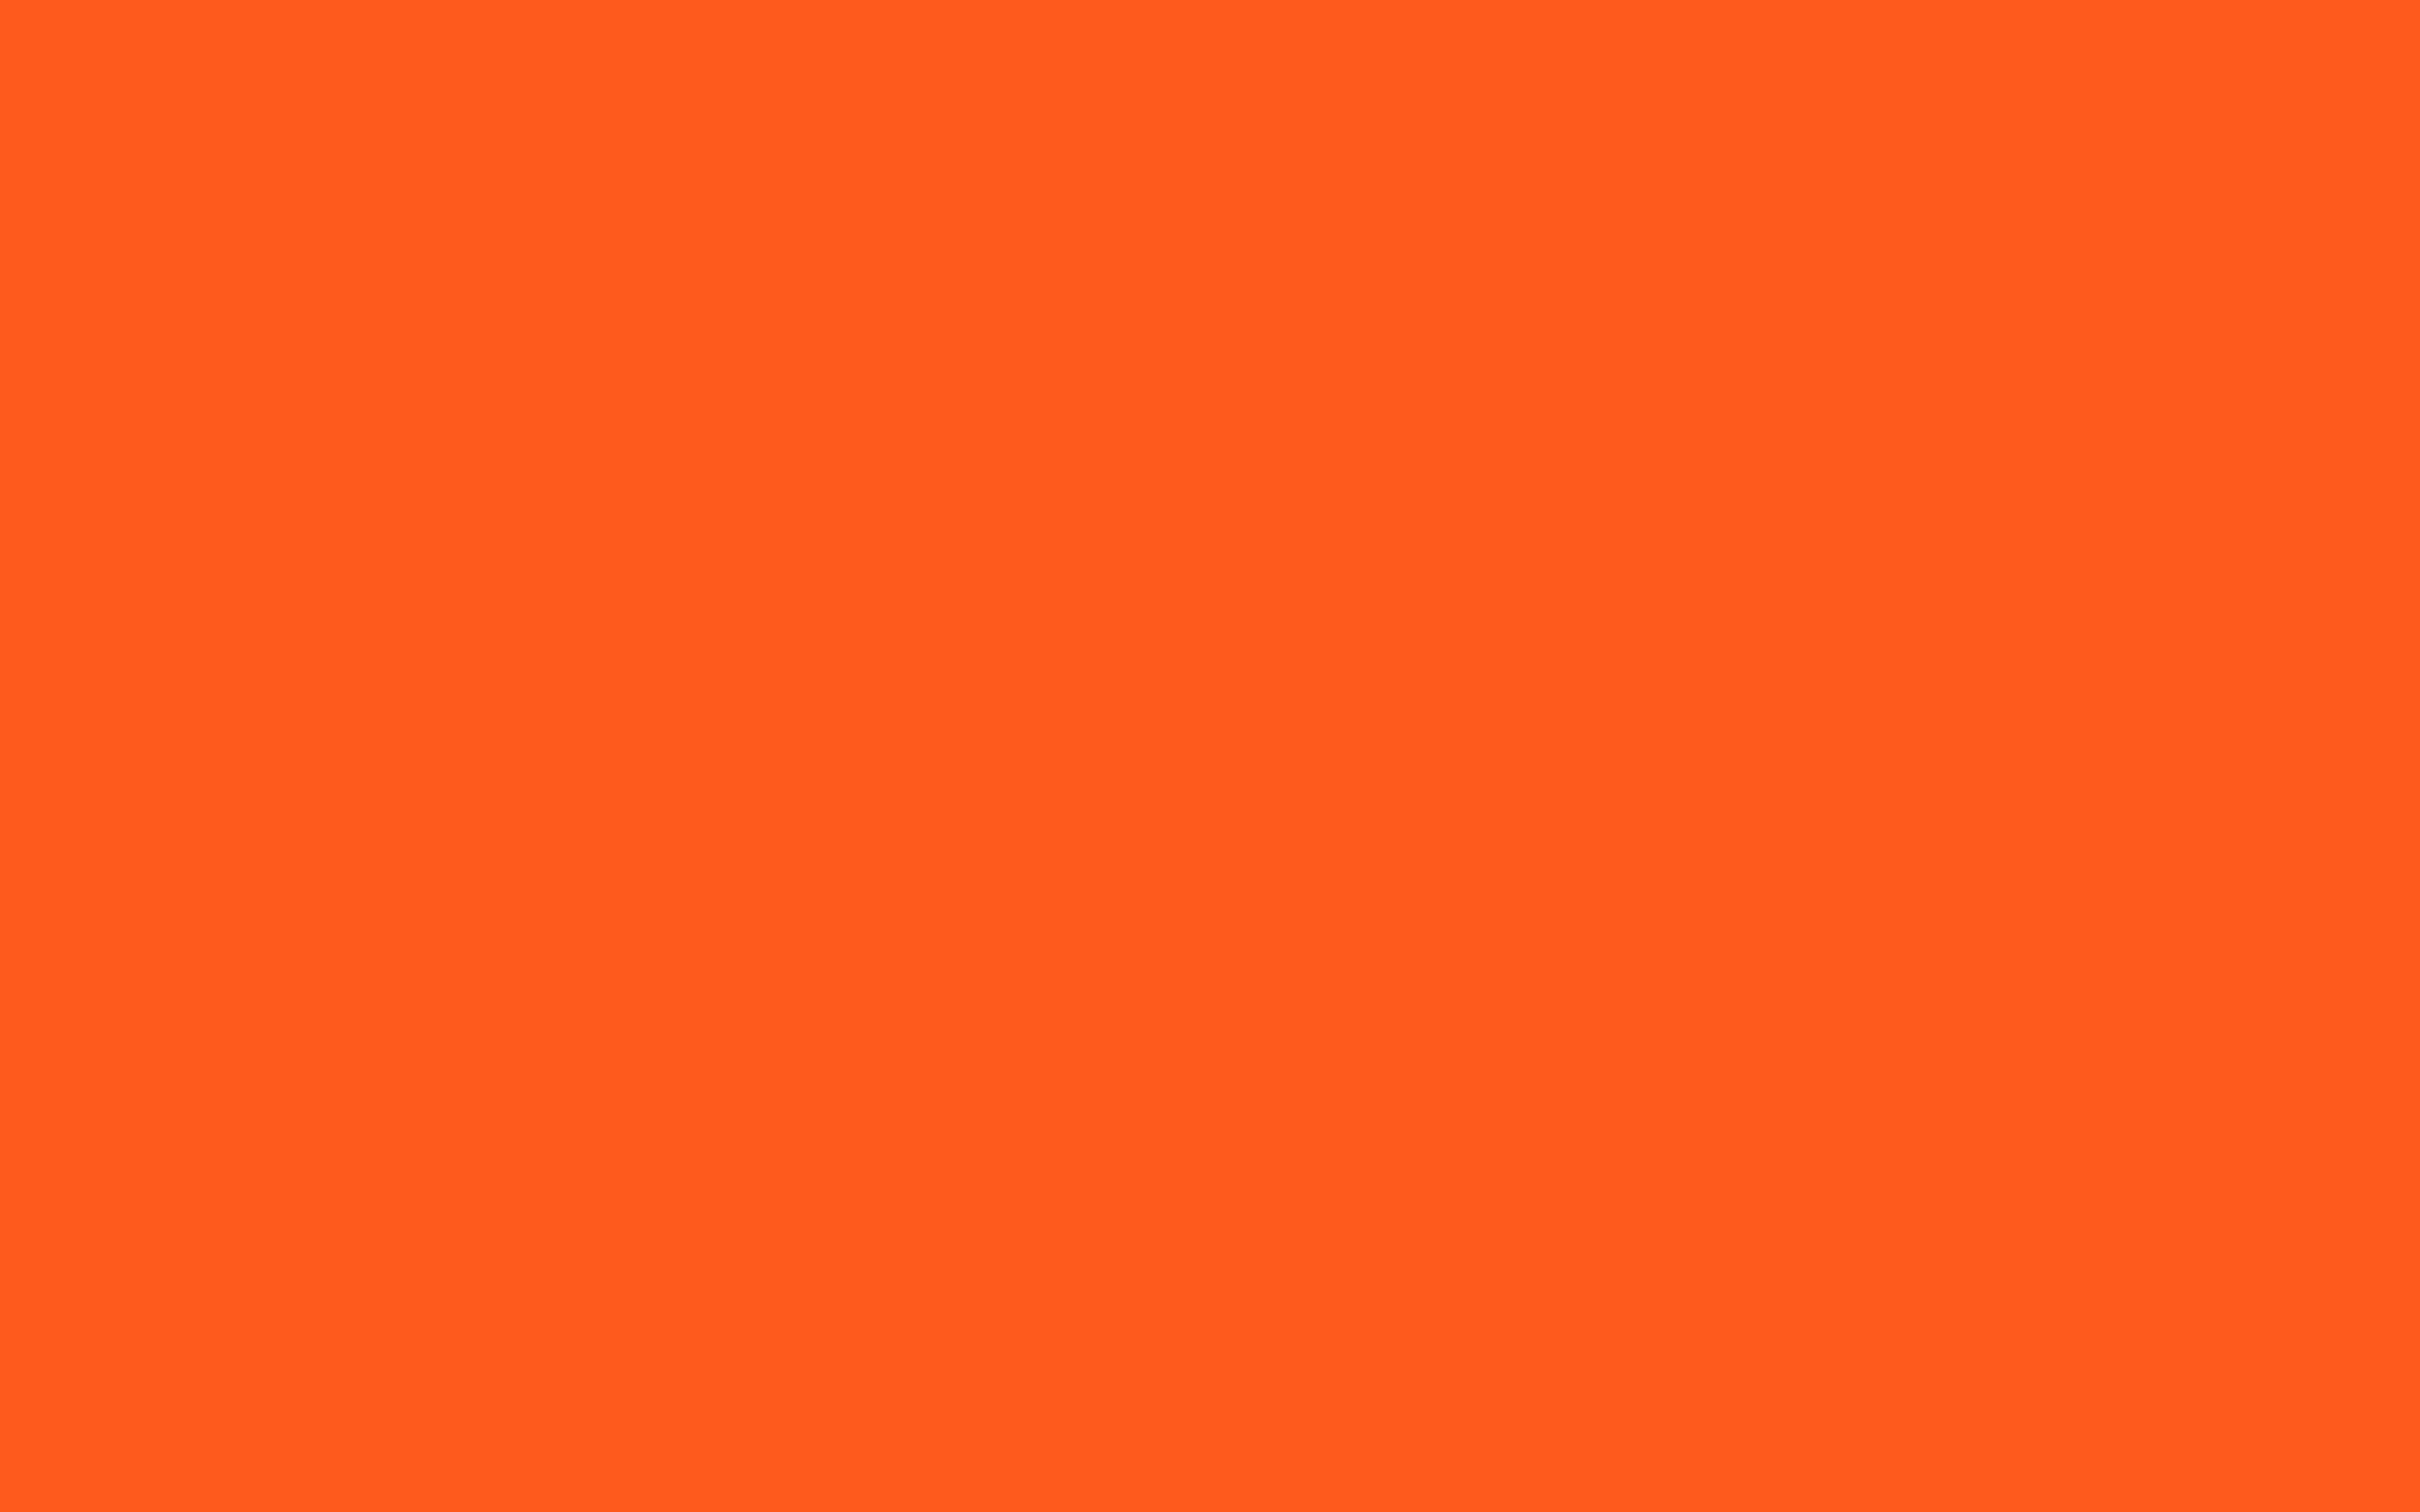 2560x1600 Giants Orange Solid Color Background